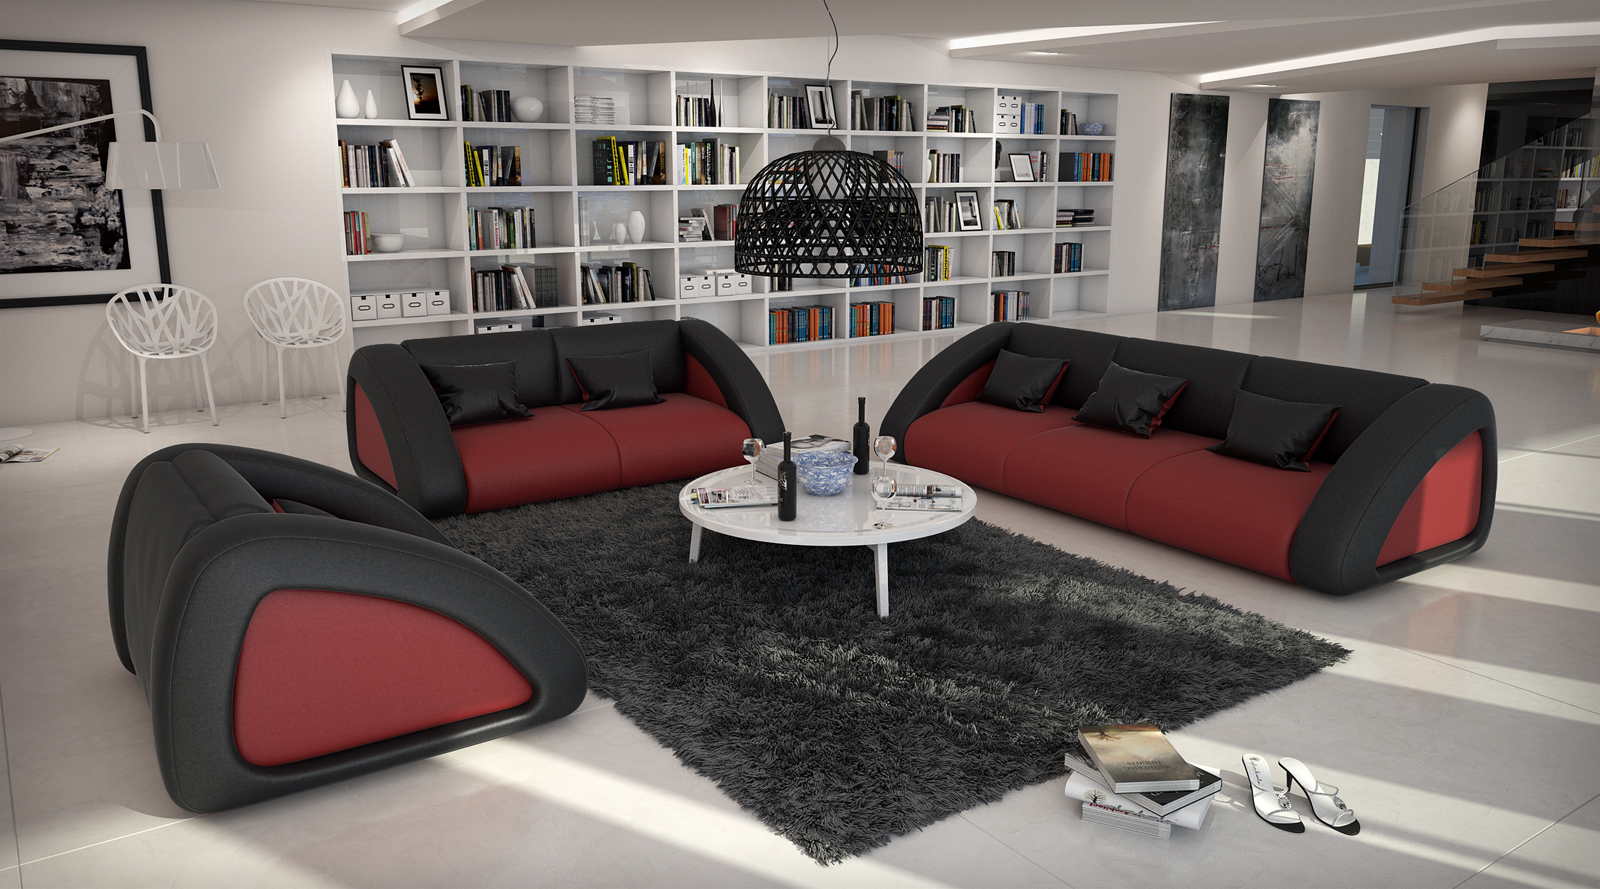 Sam sofa garnitur farbauswahl ciao combi 3 2 1 for Couch 3 2 1 garnitur